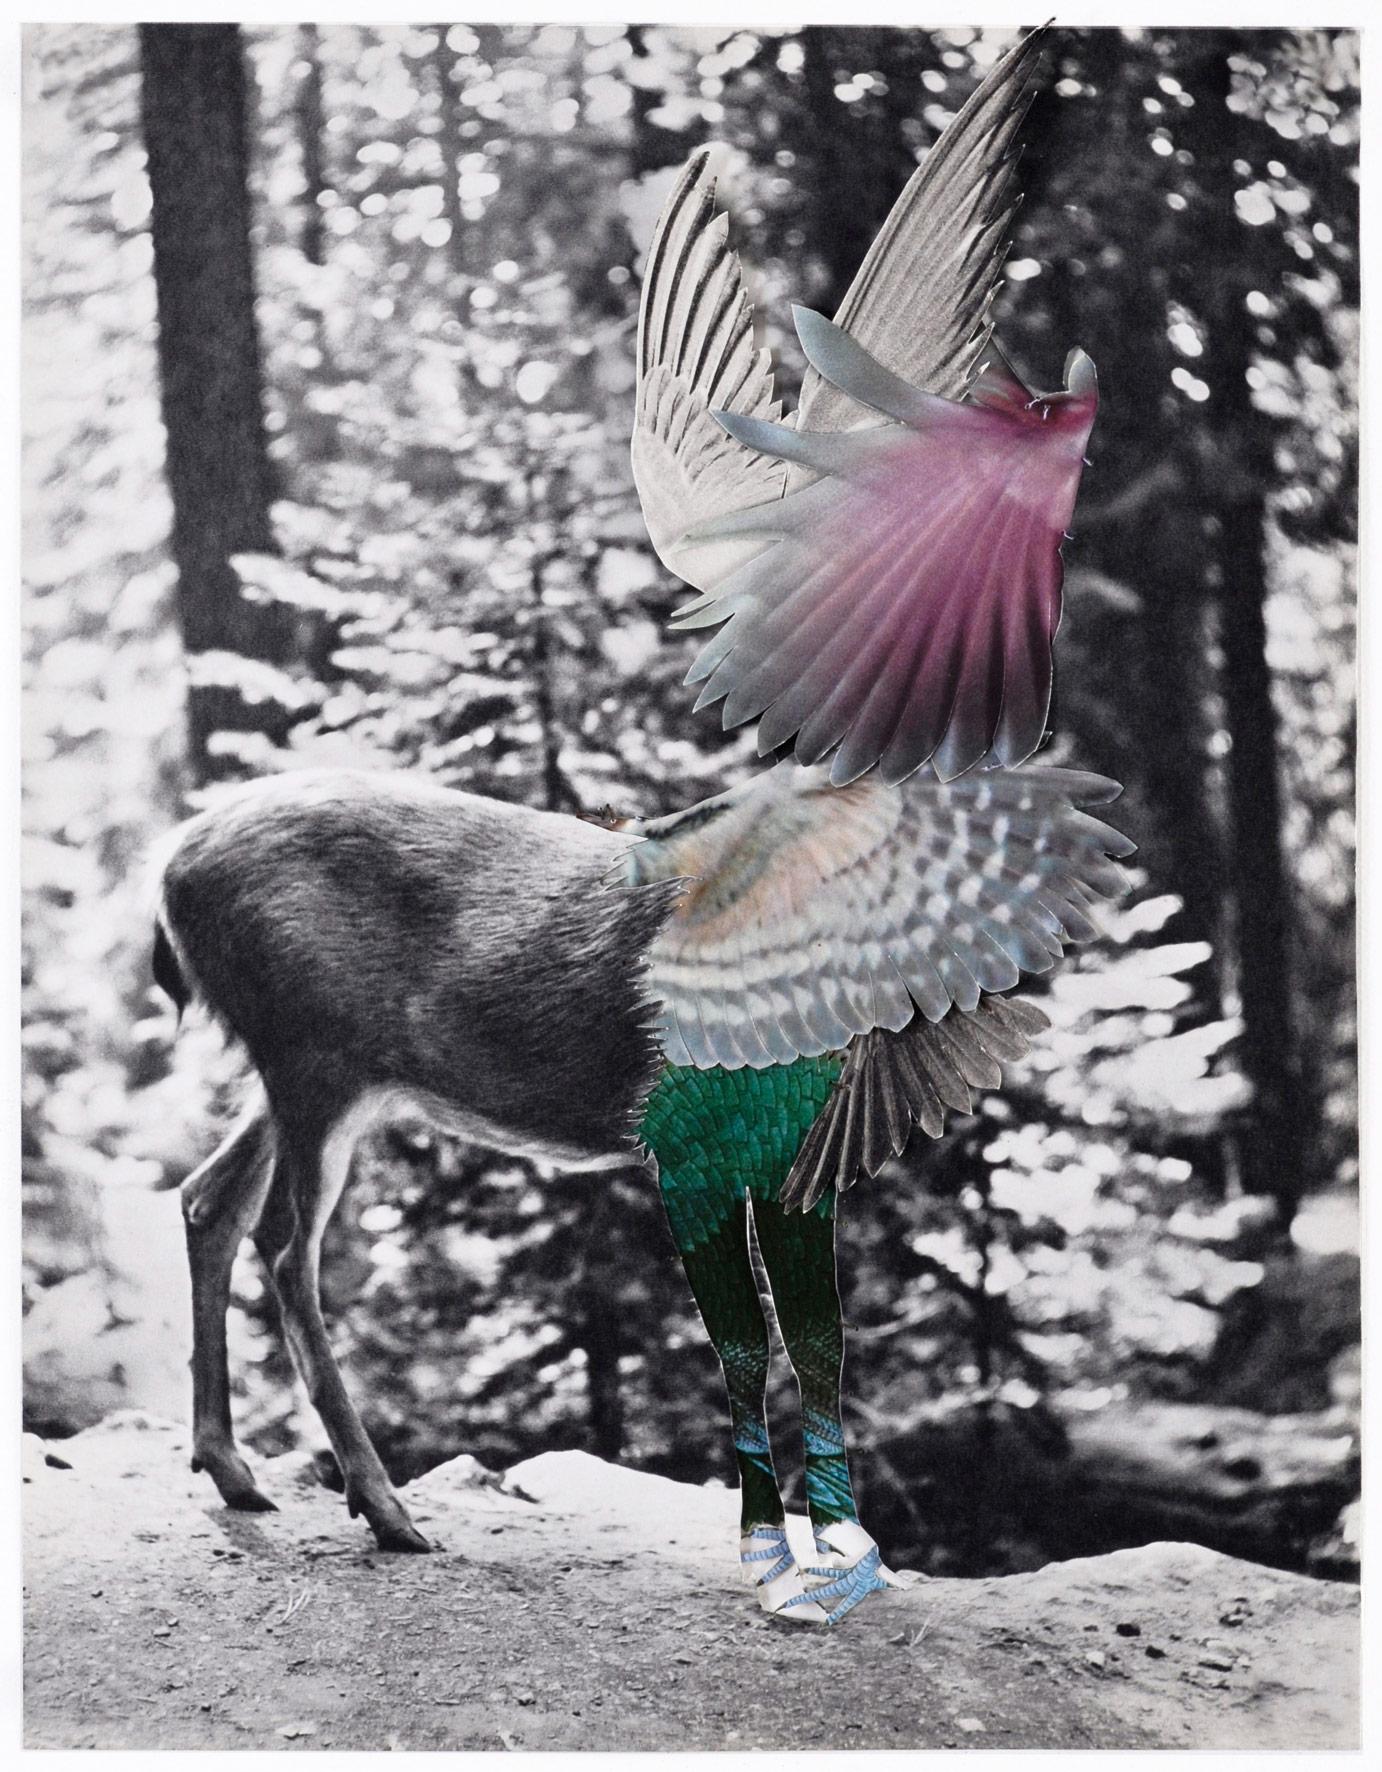 Collage#31, 2010. (Frente). Collage,papel, hilo. 31 x 24 cm.